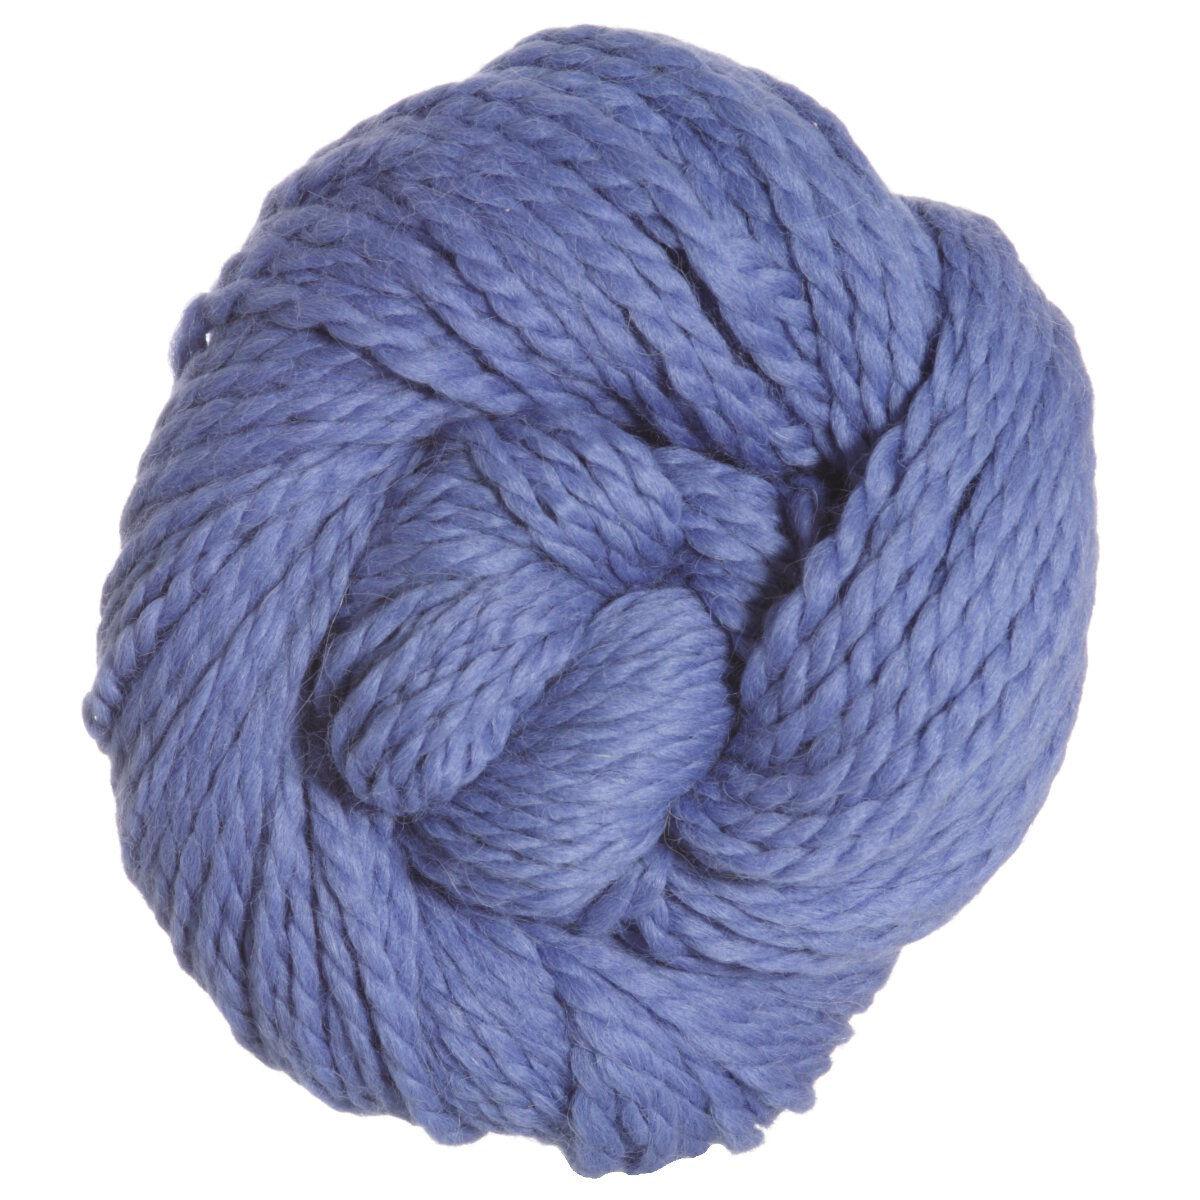 Plymouth Yarn Baby Alpaca Grande Yarn 6033 Denim At